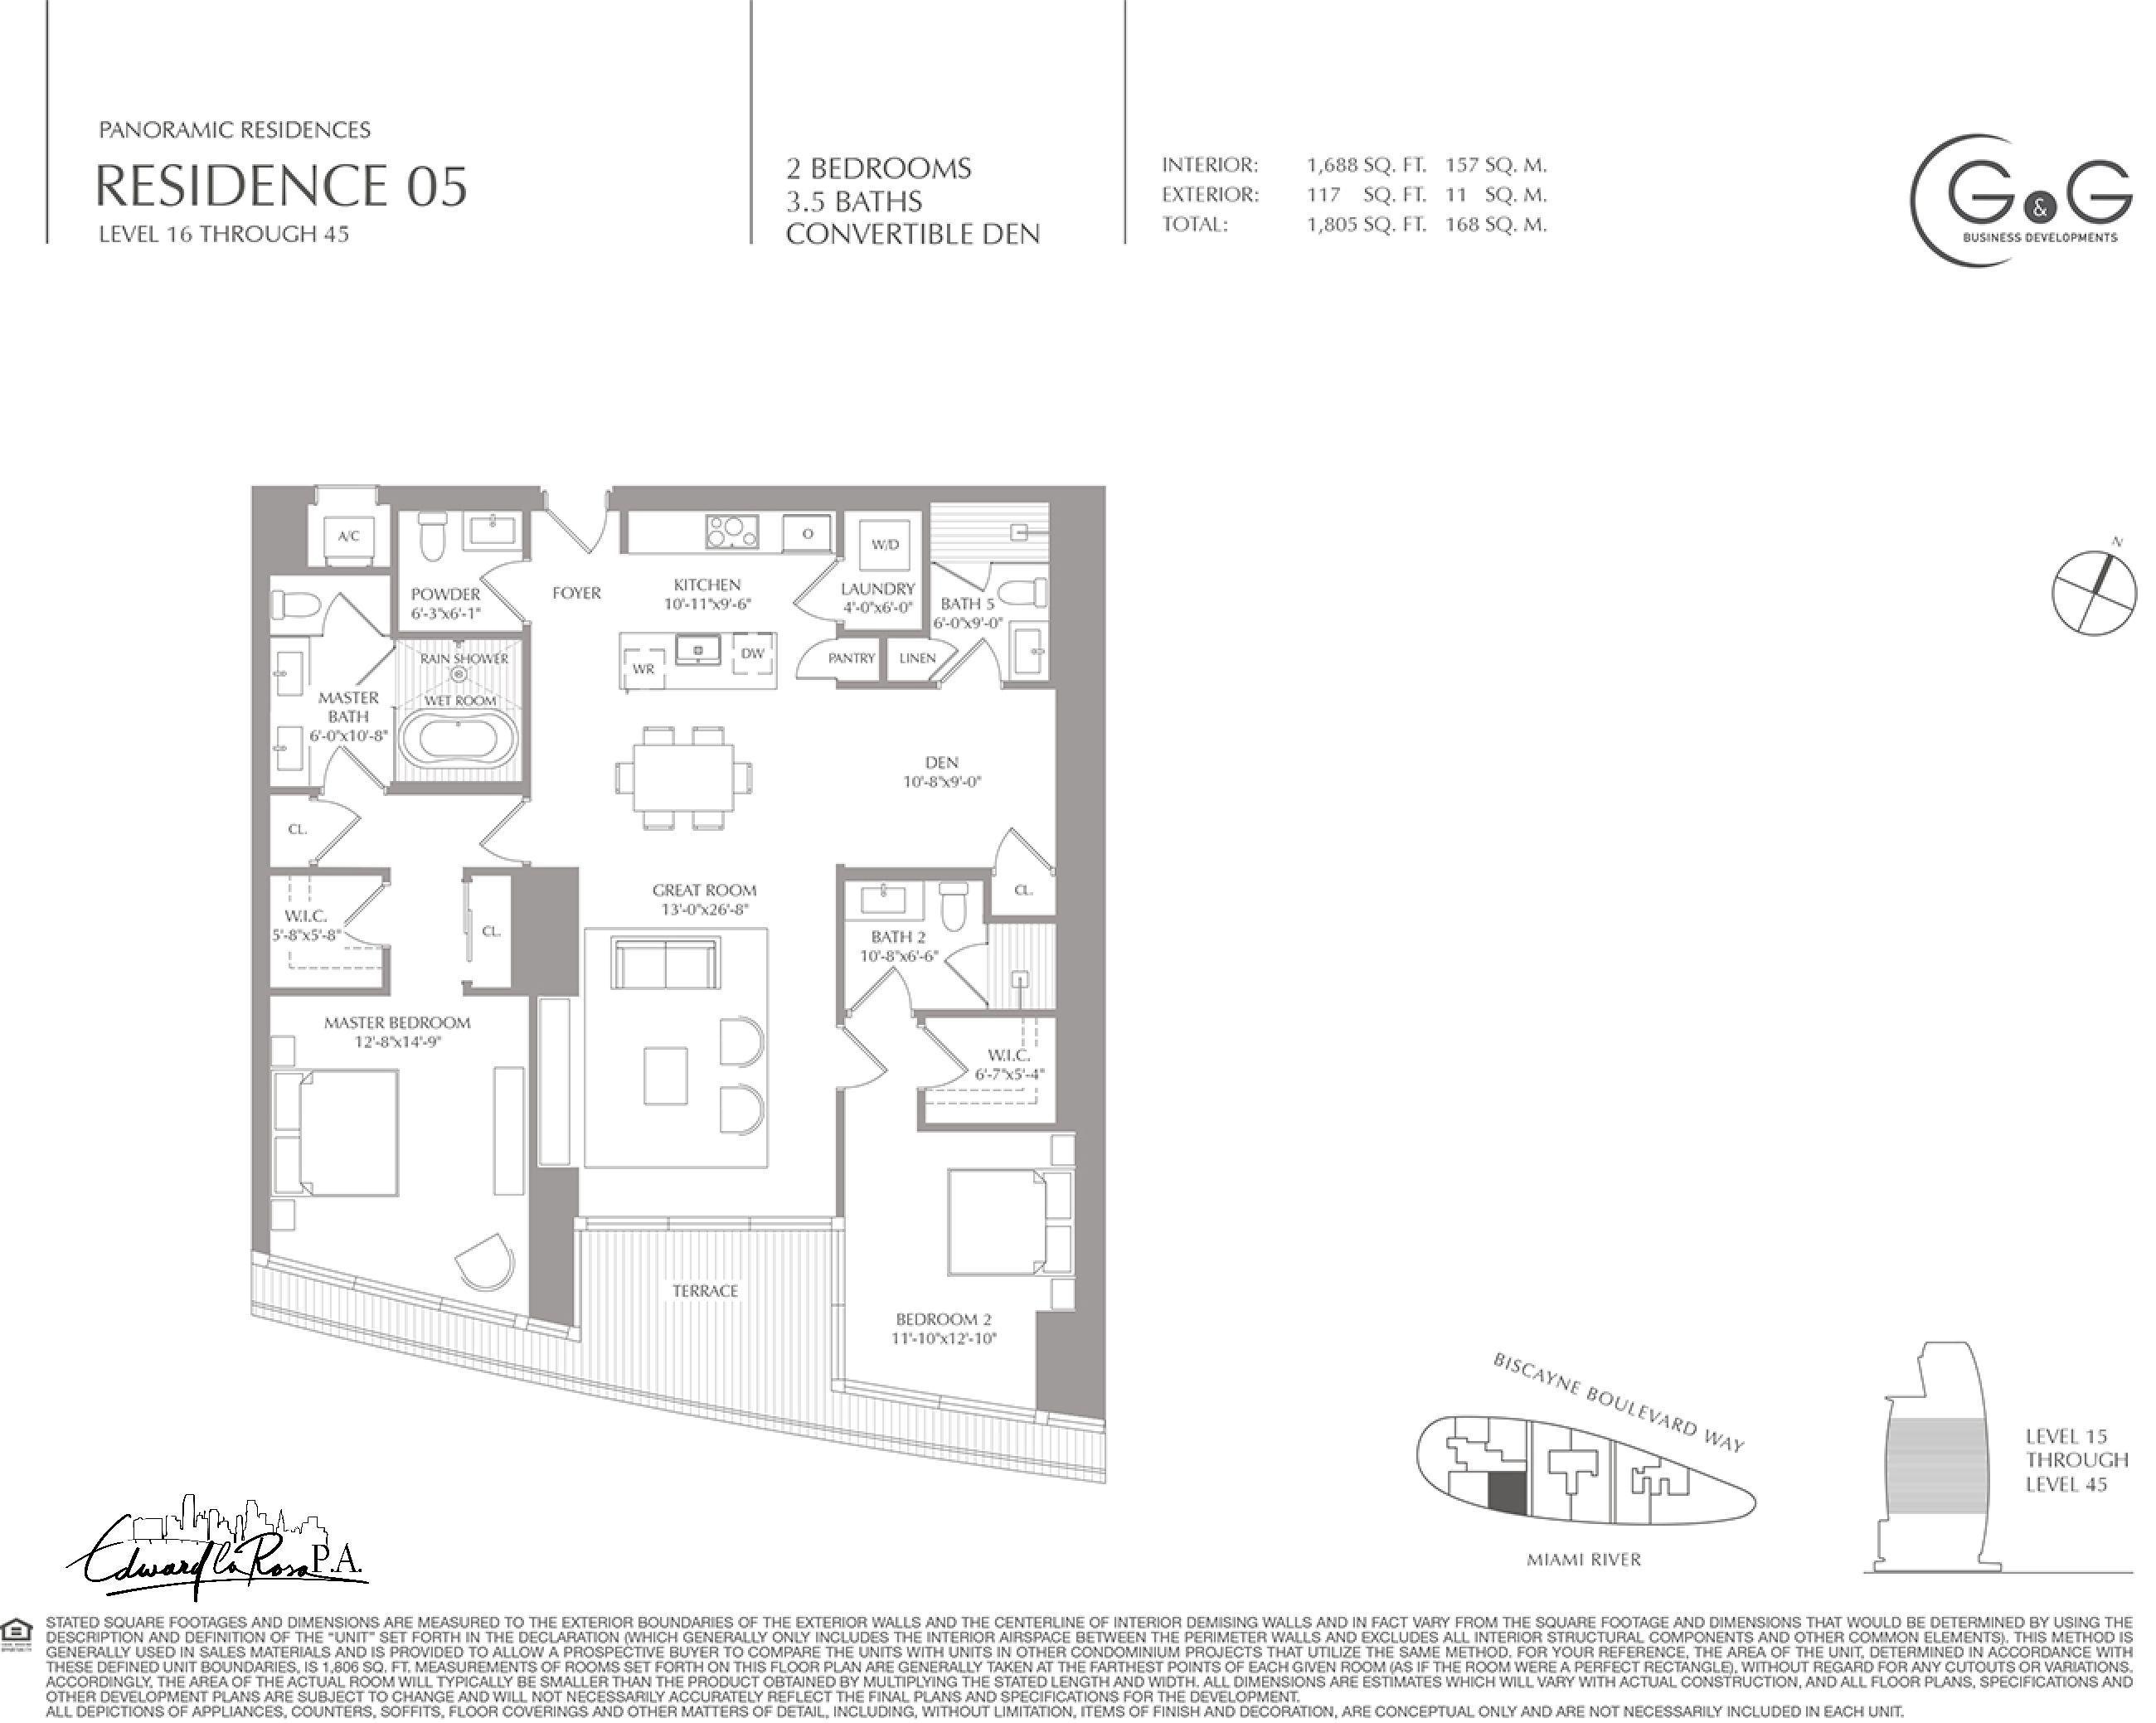 Aston Martin Panoramic Residences Floor Plans Residences Aston Martin